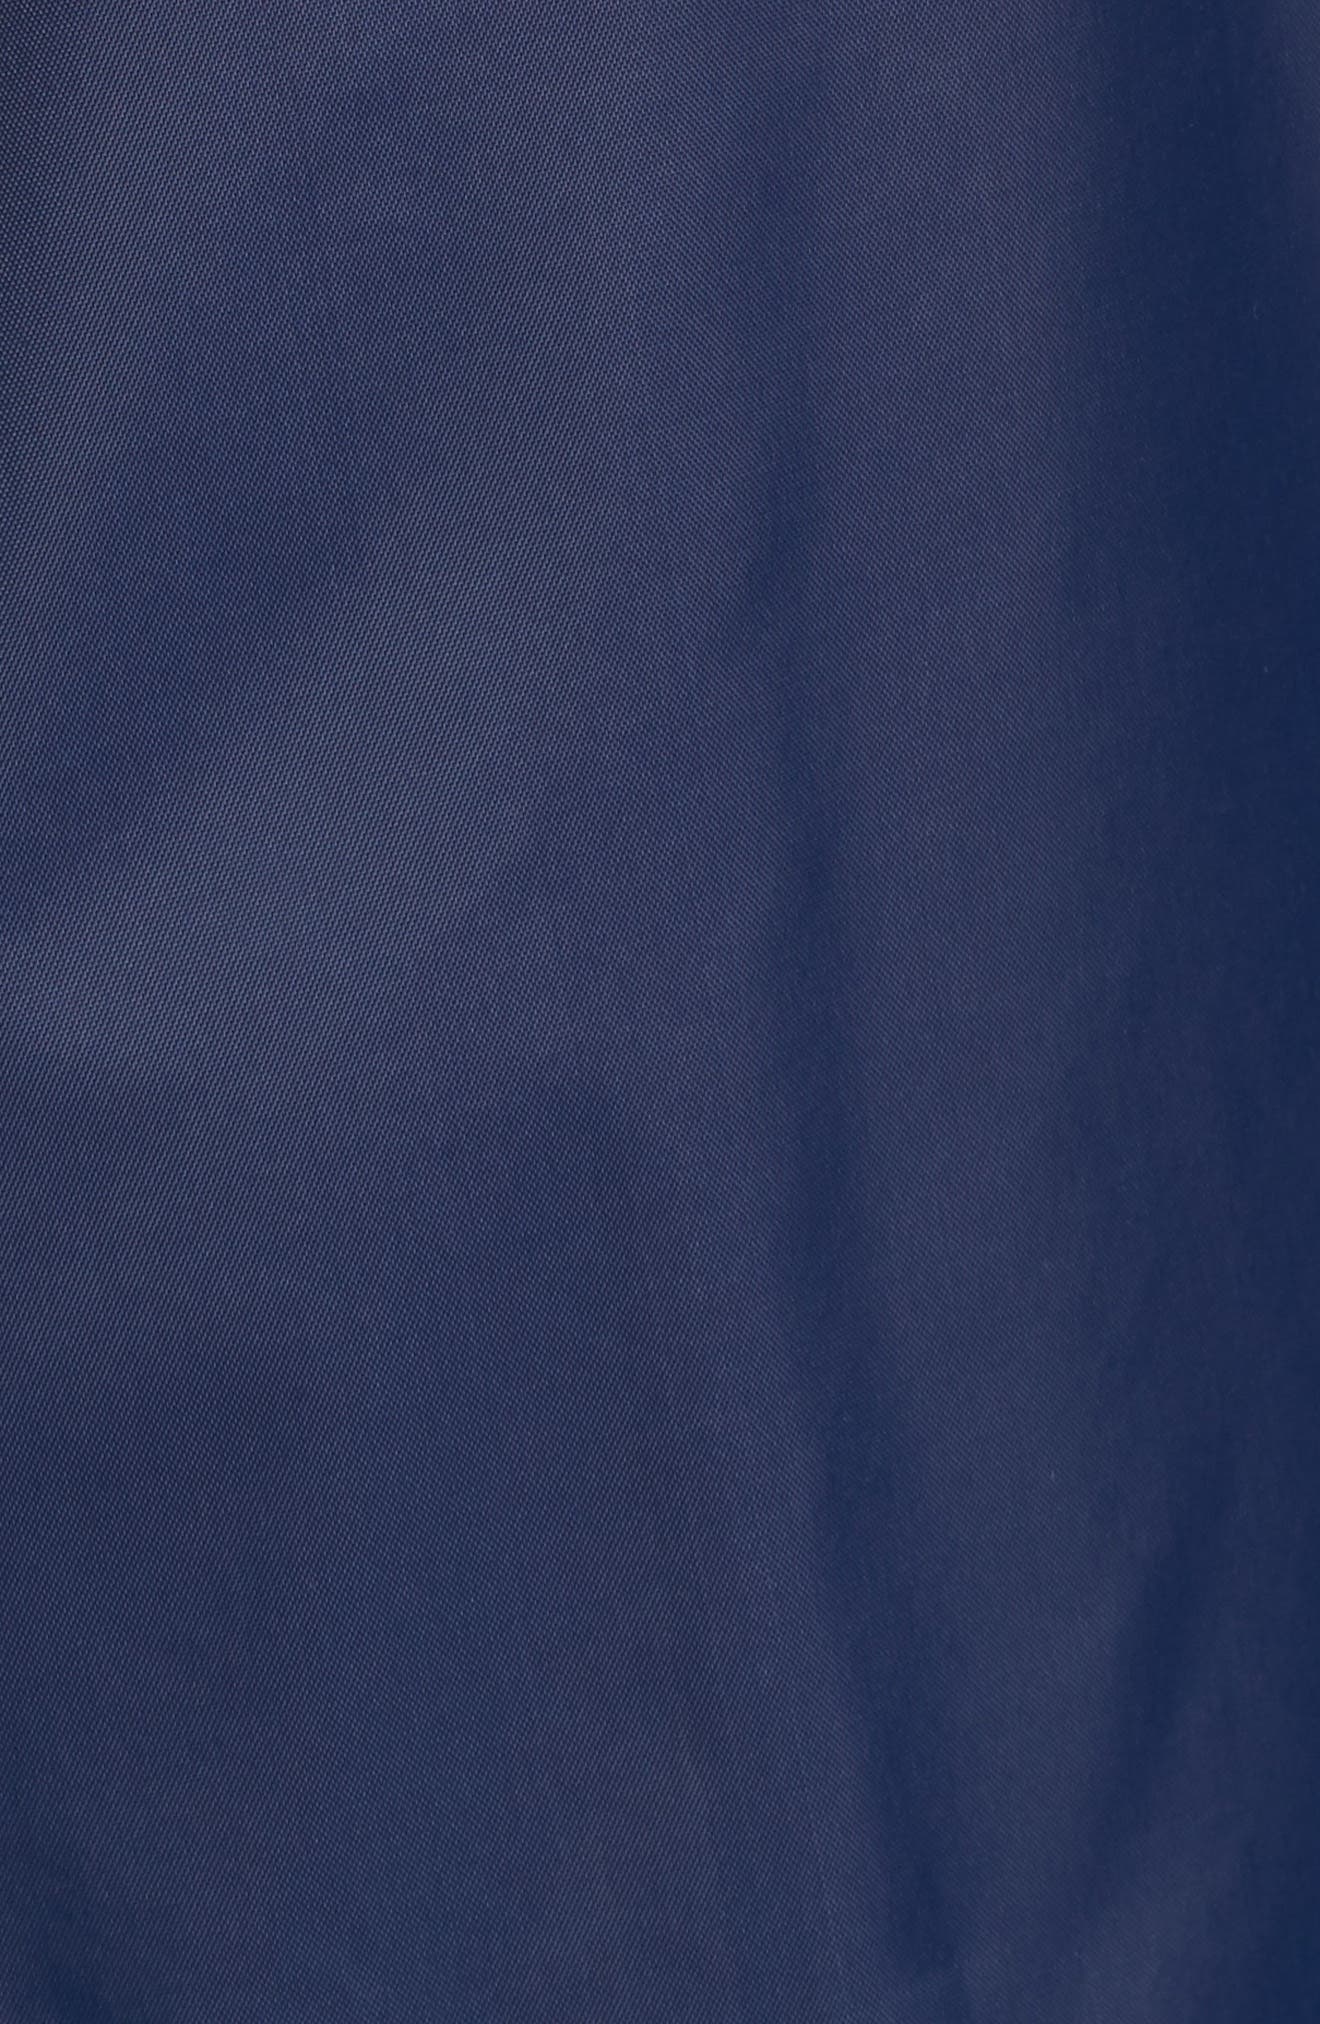 Retro Hooded Coach's Jacket,                             Alternate thumbnail 6, color,                             Navy